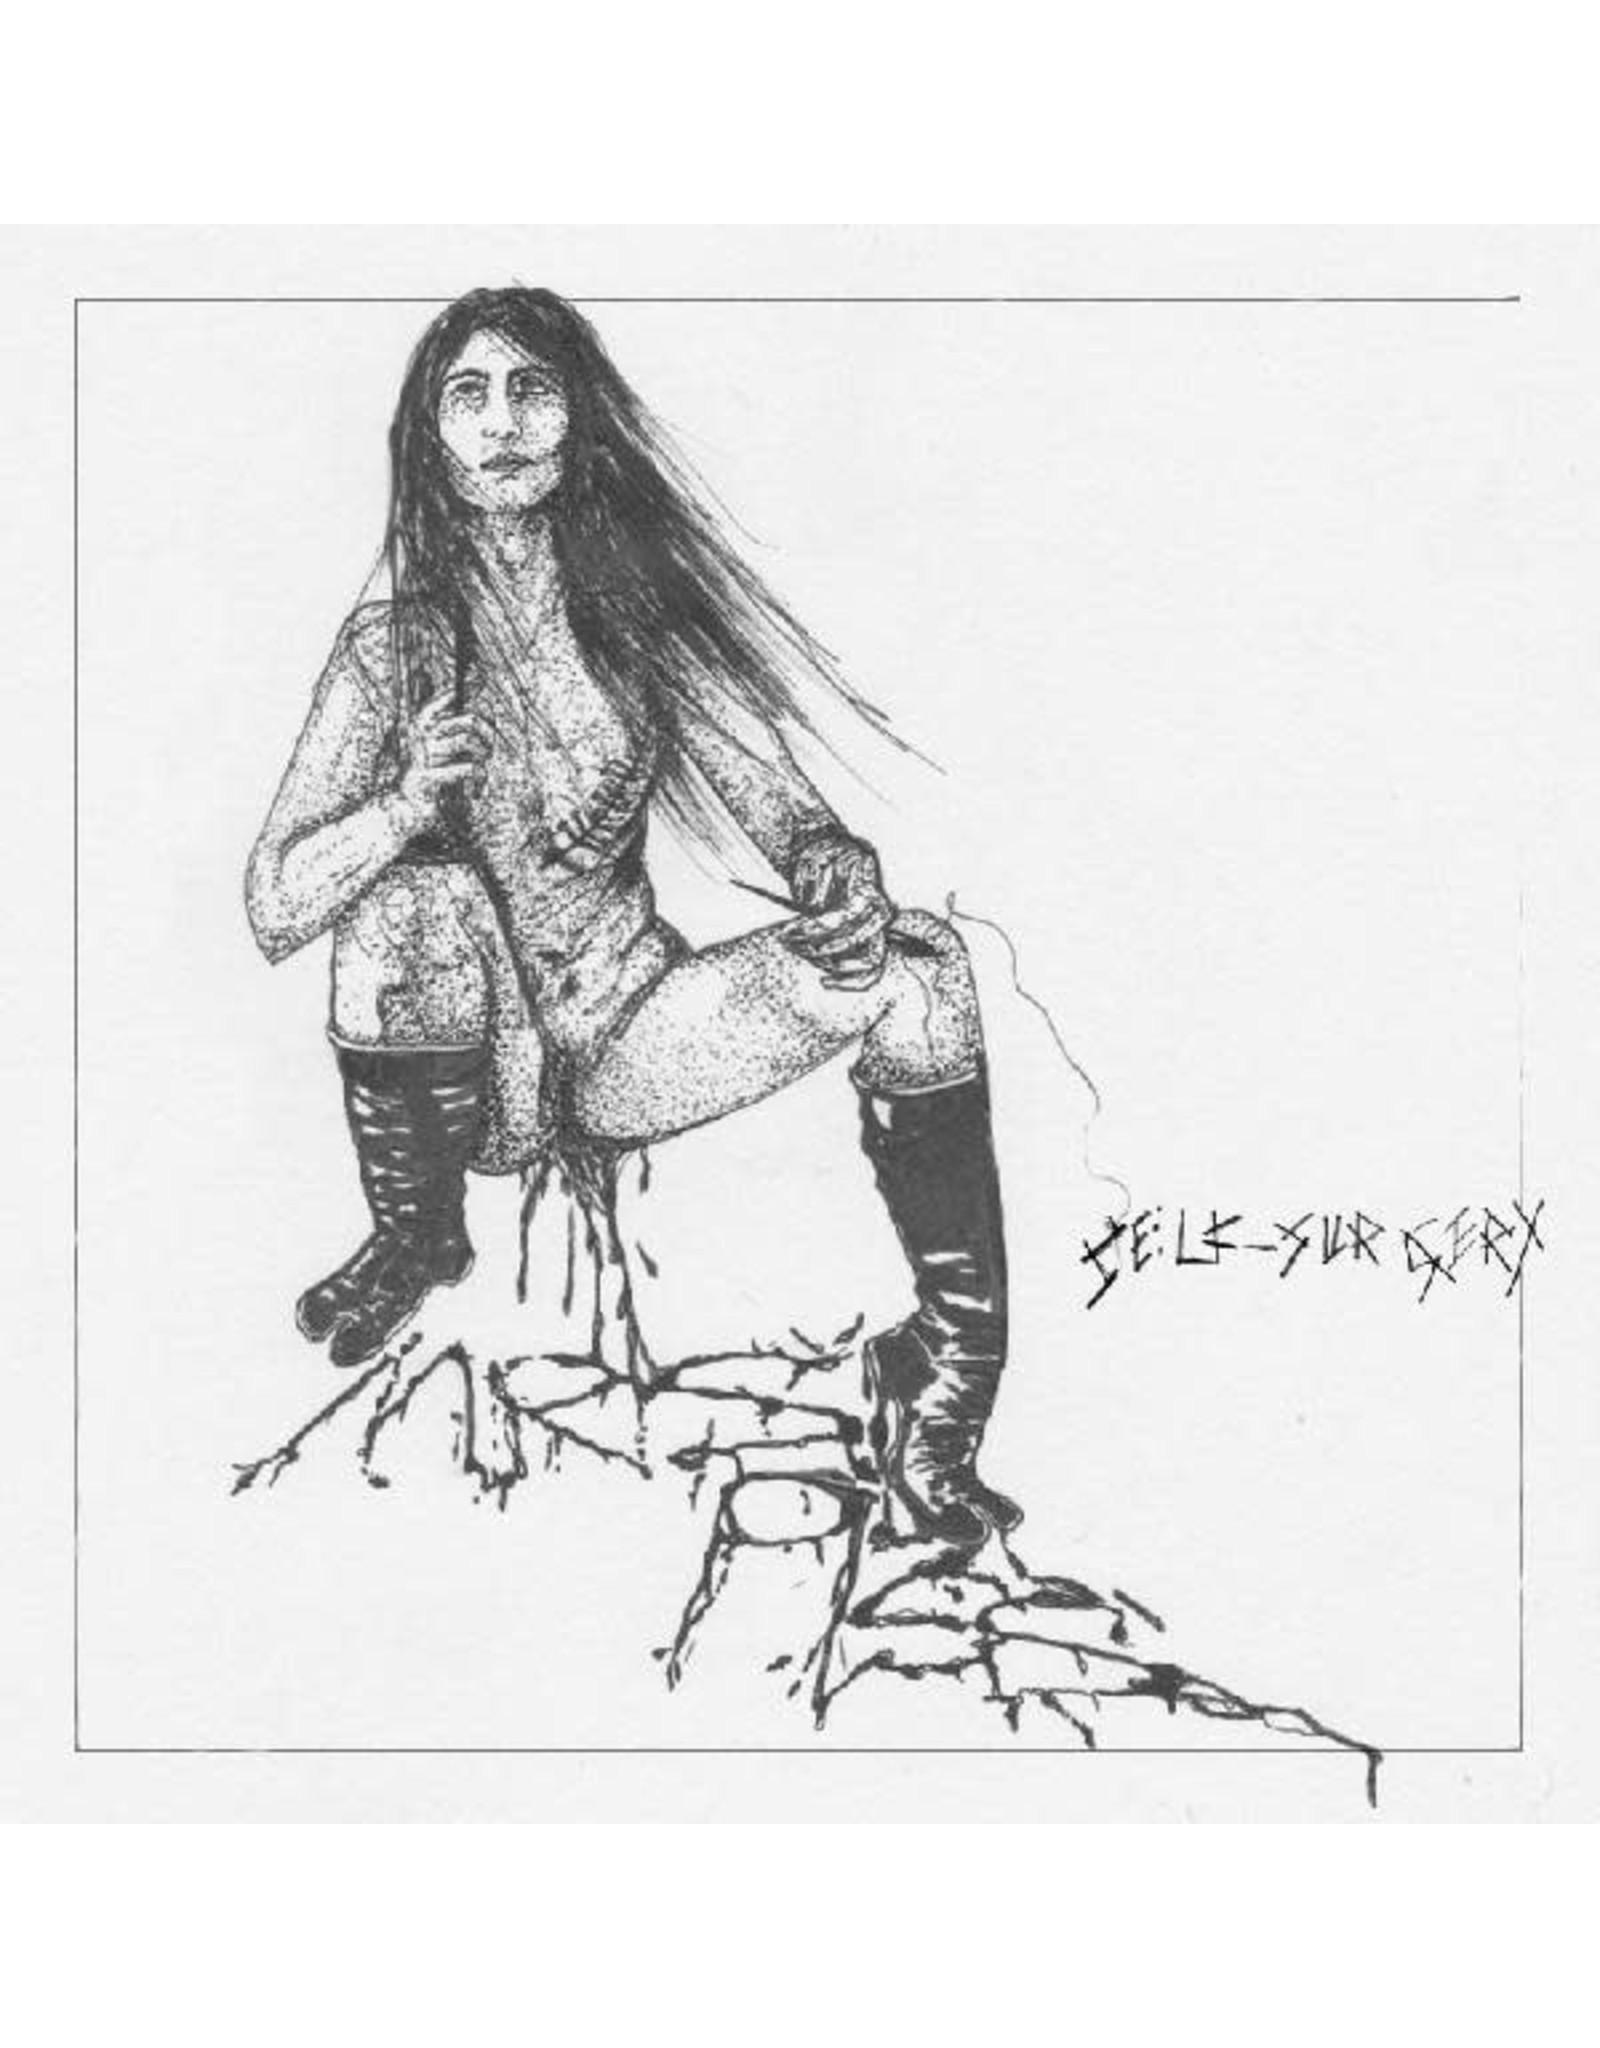 New Vinyl Mrs. Piss - Self Surgery LP